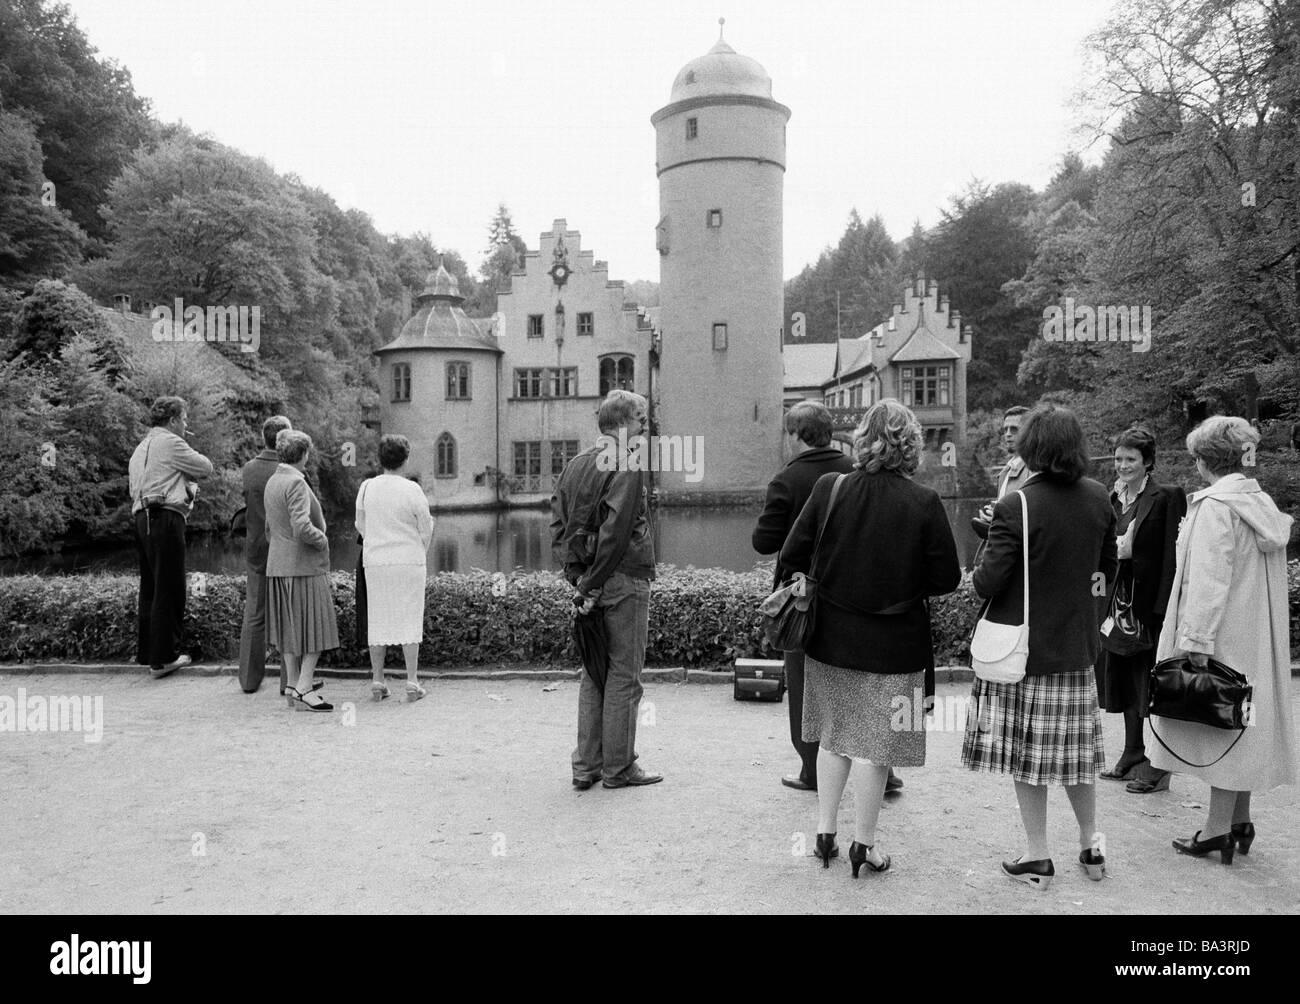 Eighties, black and white photo, tourism, people at the Castle Mespelbrunn, moated castle, renaissance, D-Mespelbrunn, - Stock Image